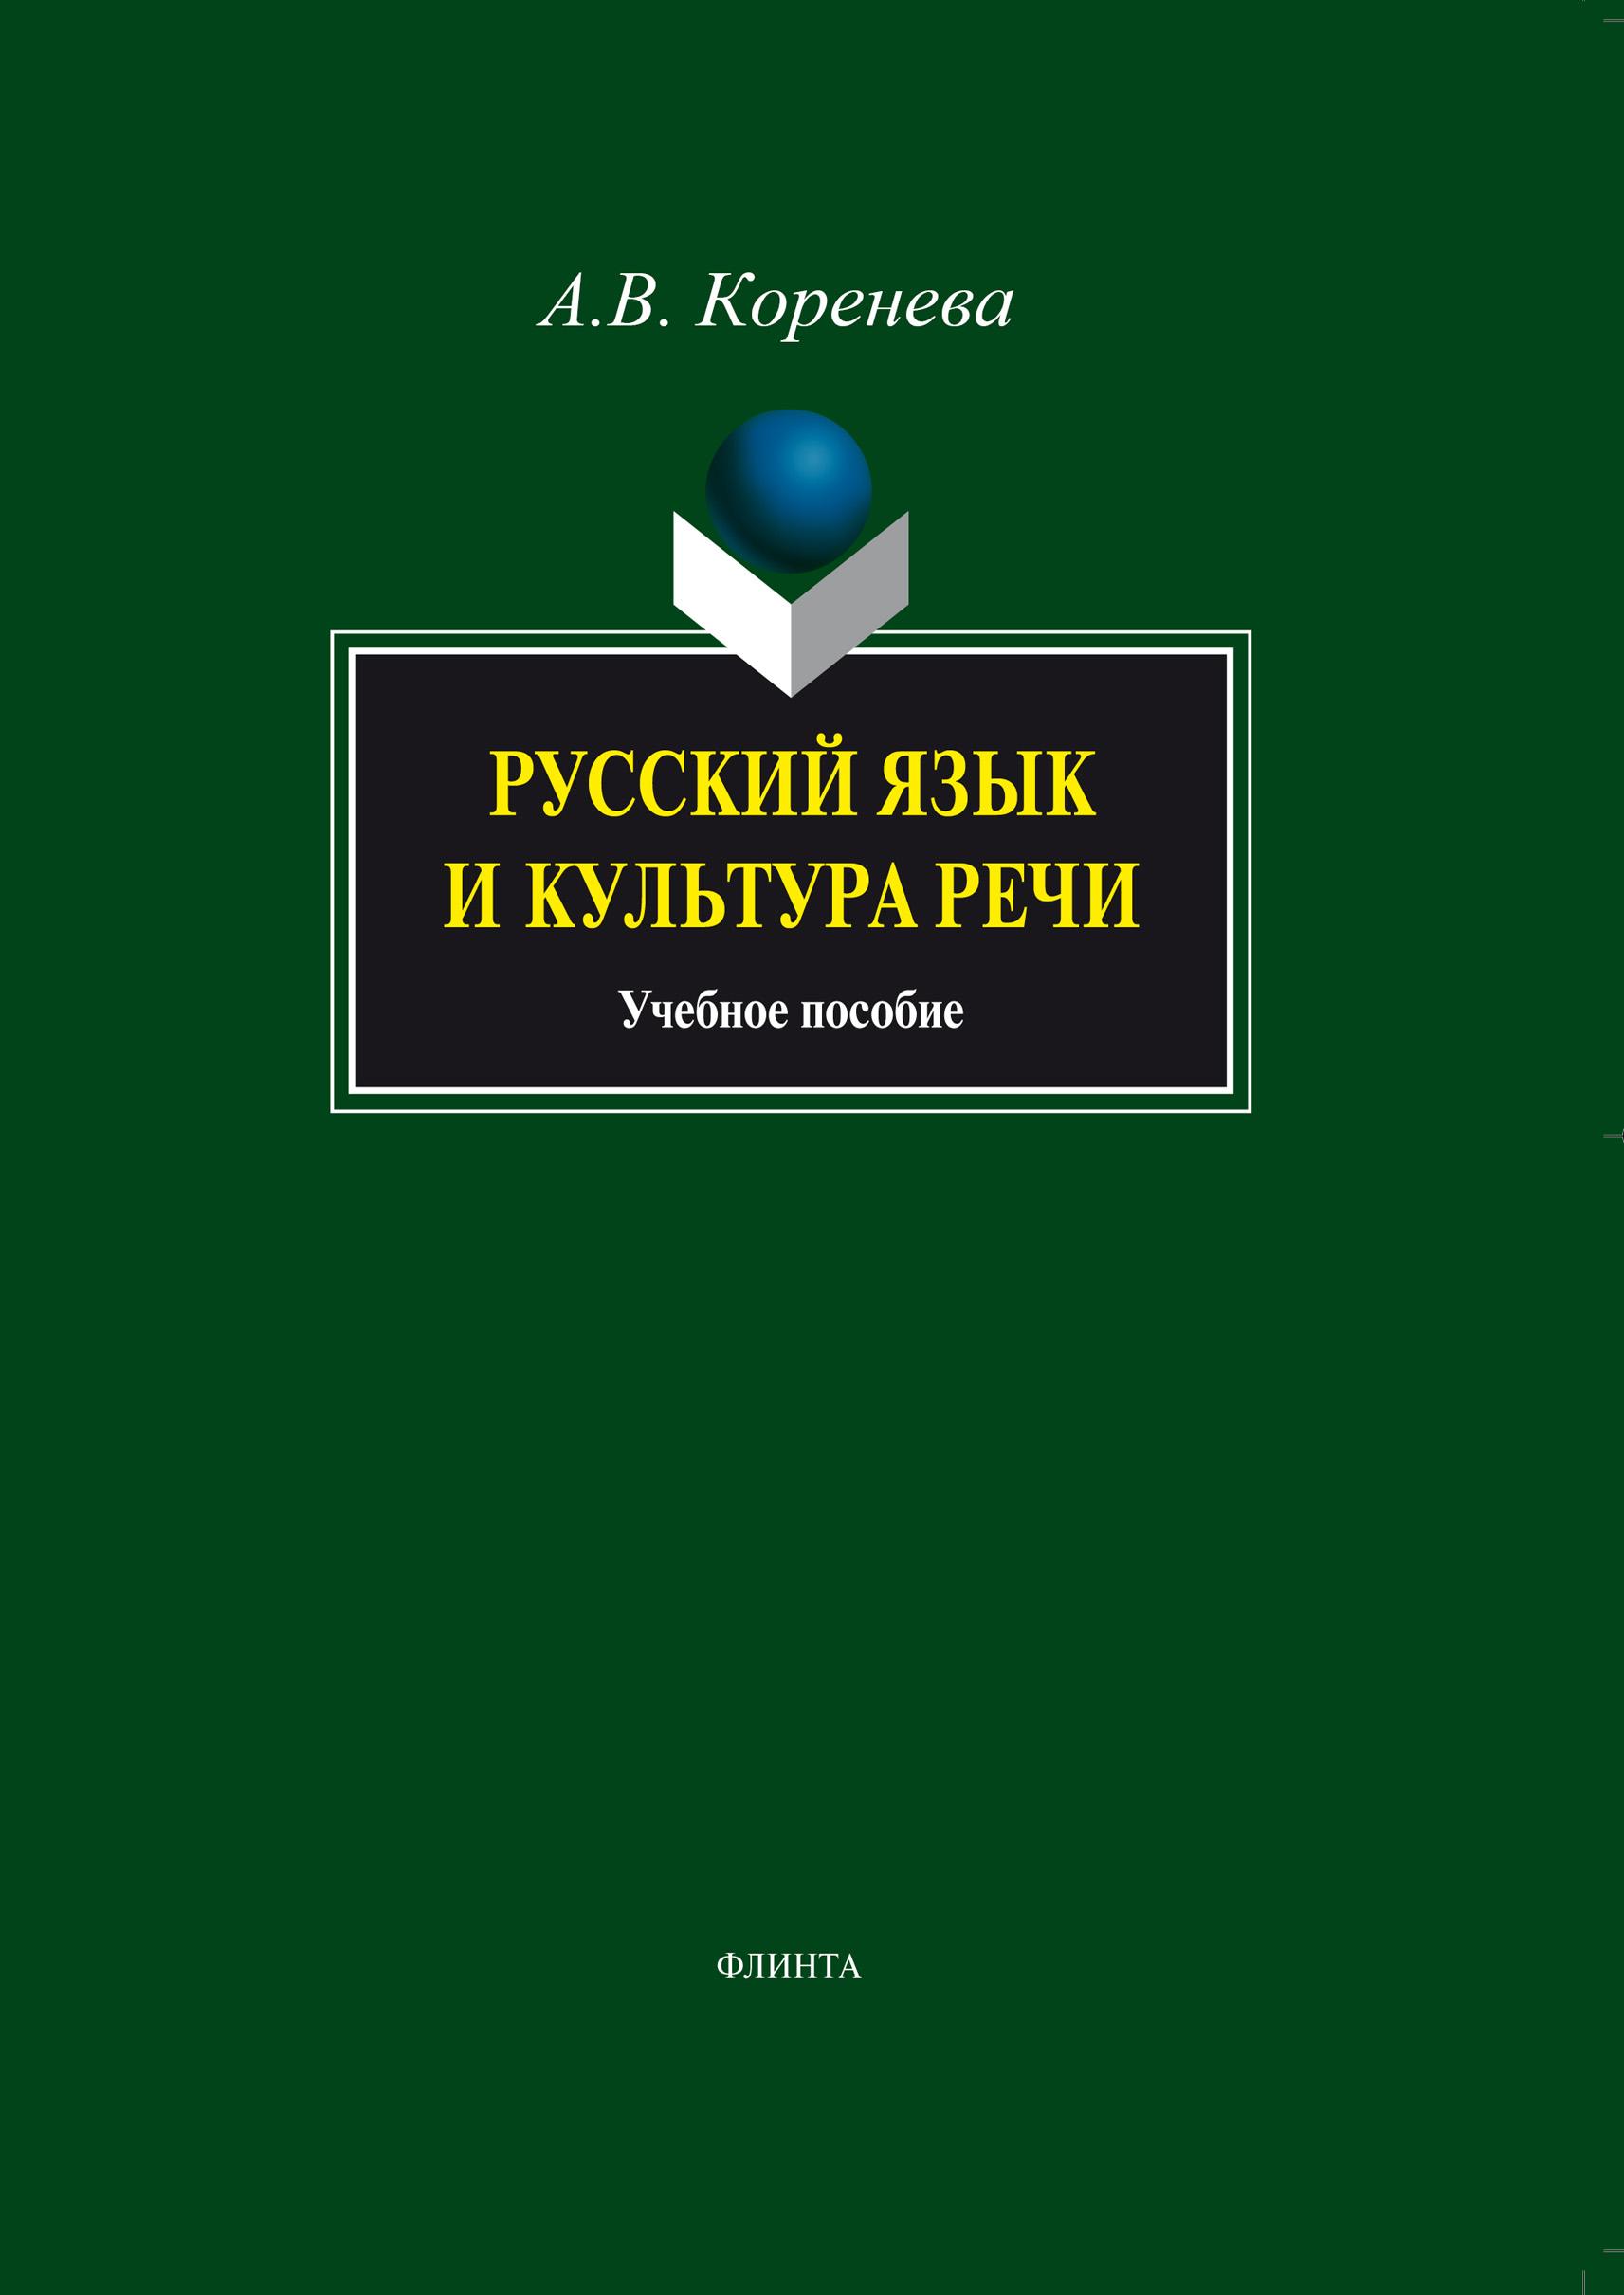 А. В. Коренева Русский язык и культура речи. Учебное пособие коренева е я белка